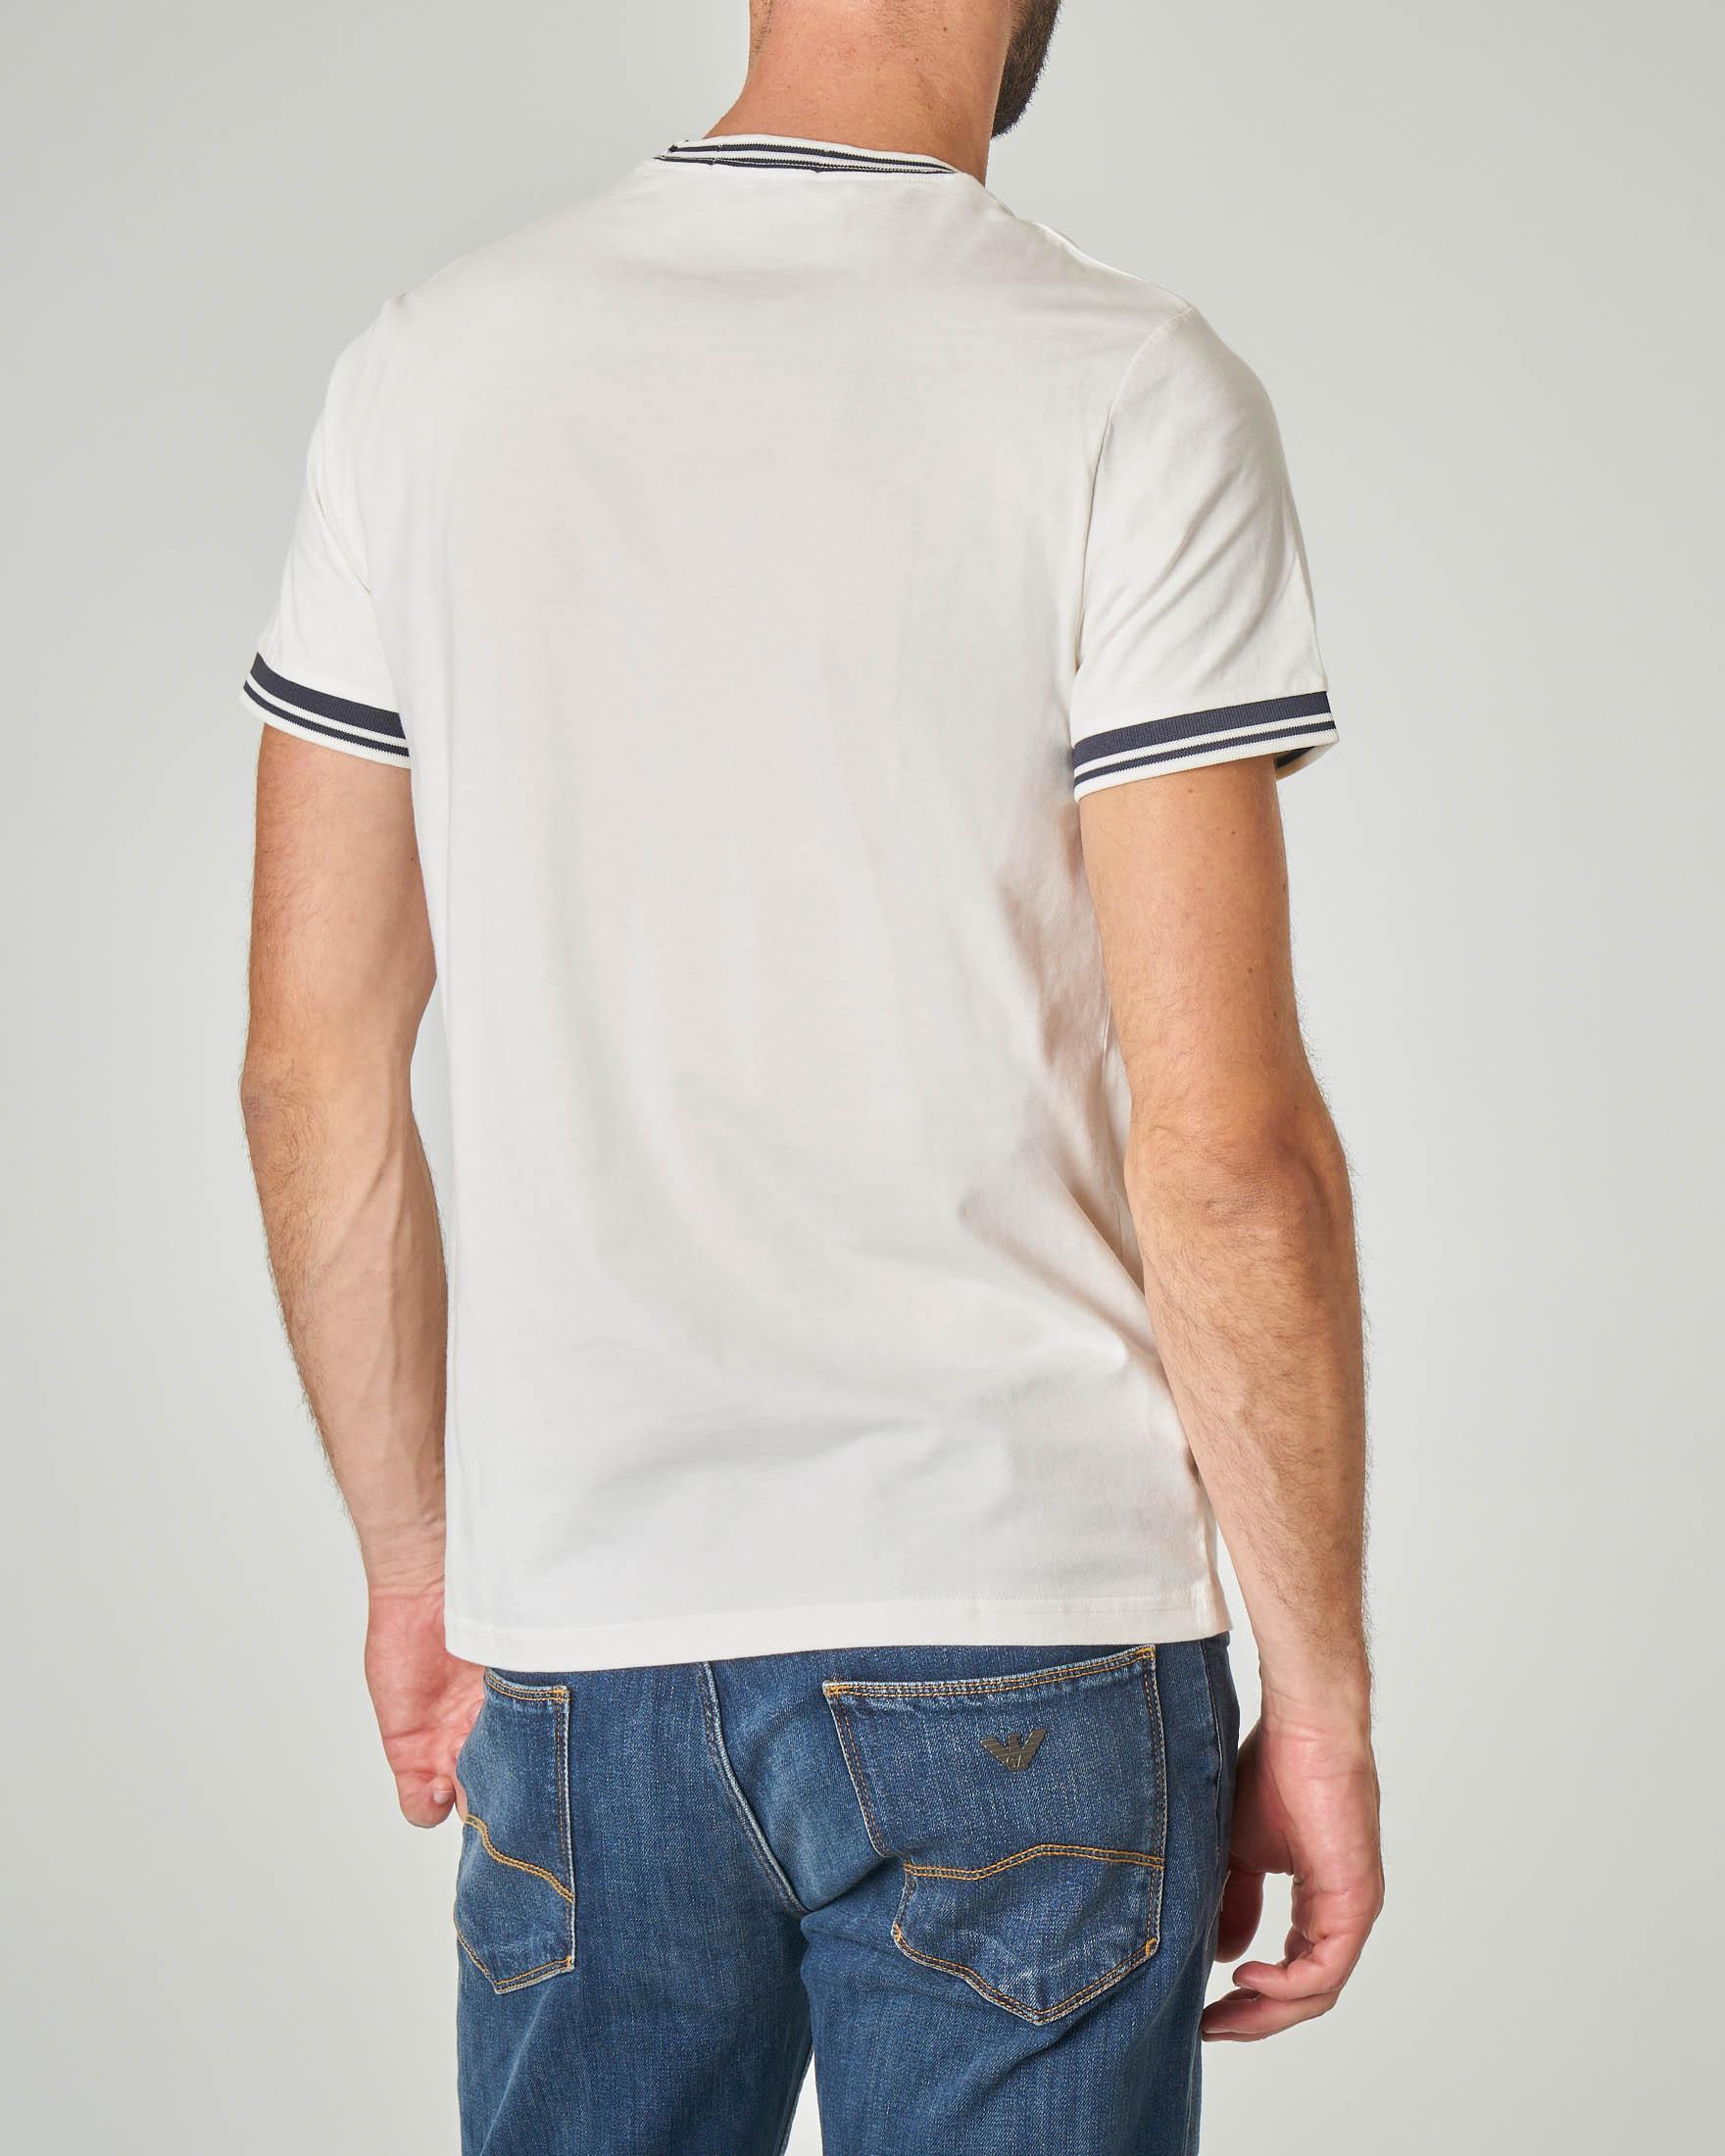 T-shirt bianca con bordini e logo